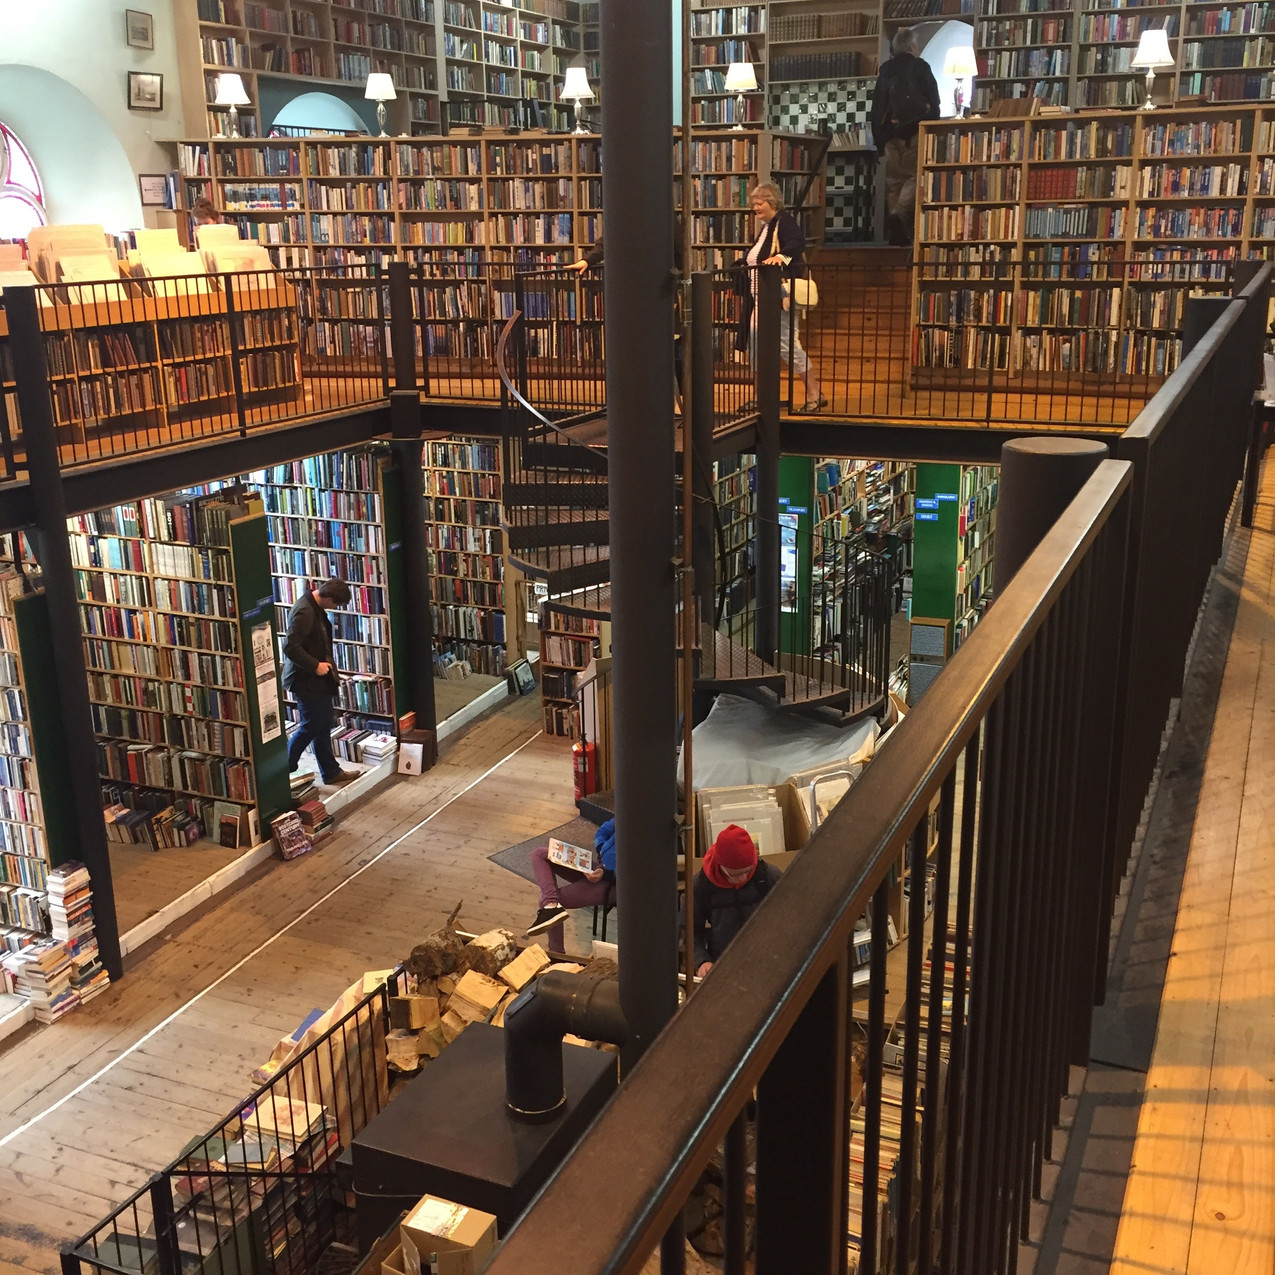 Leakey's Bookshop - Inverness